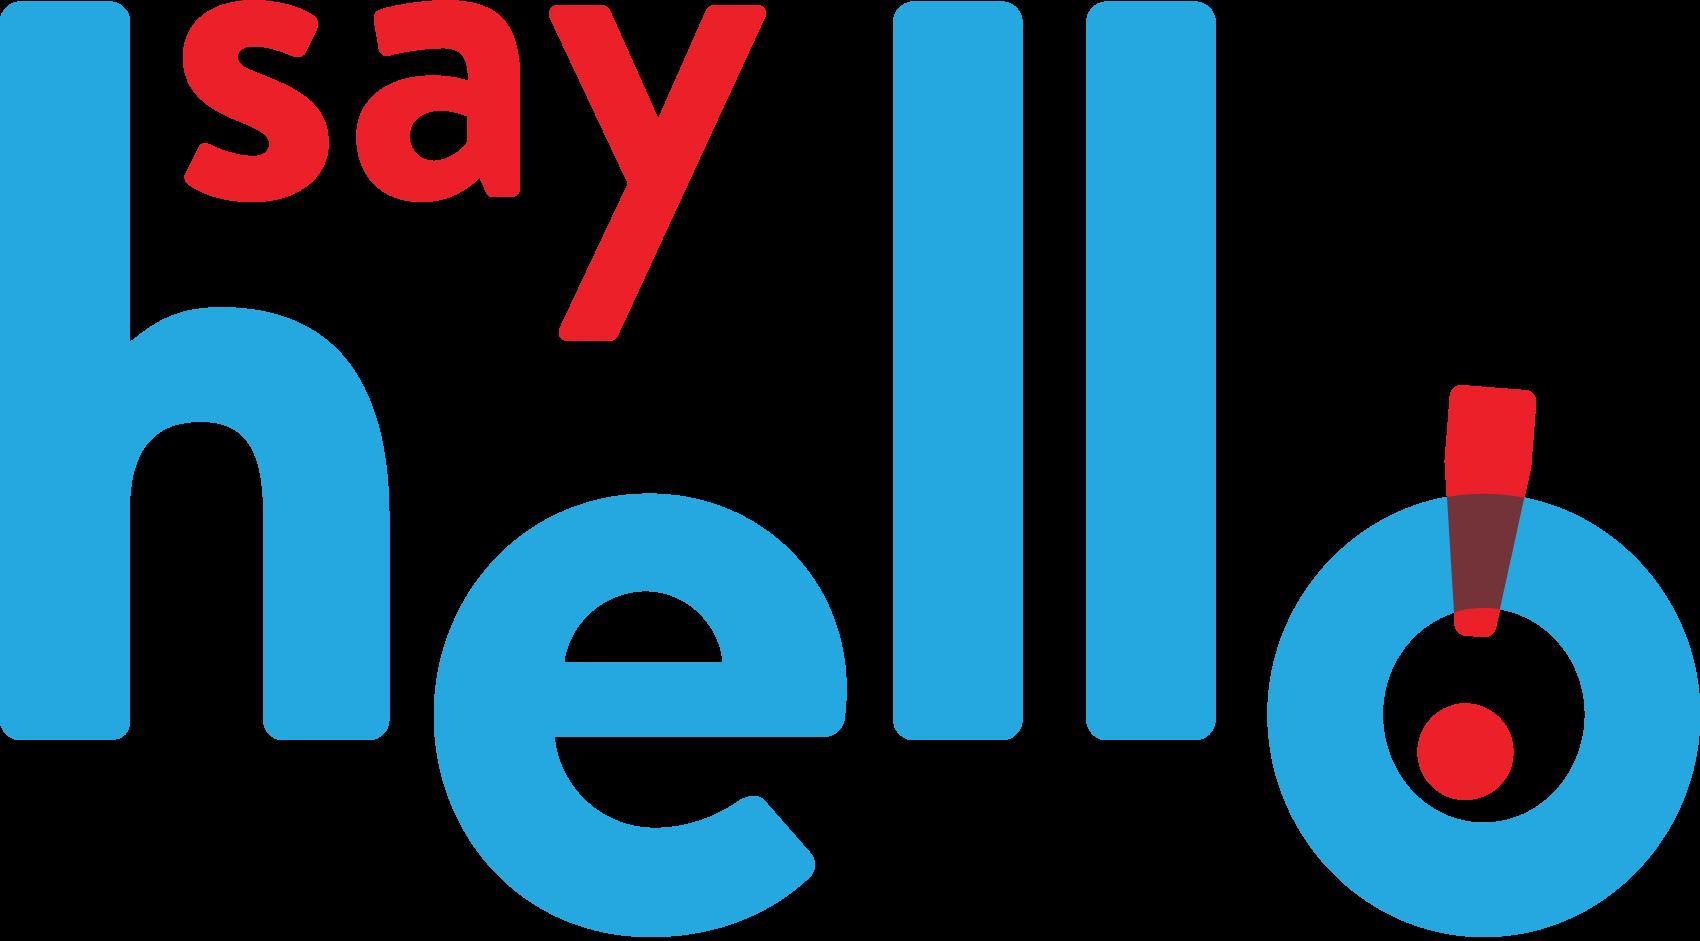 Say Hello Sweets logo — by Dima Yagnyuk.